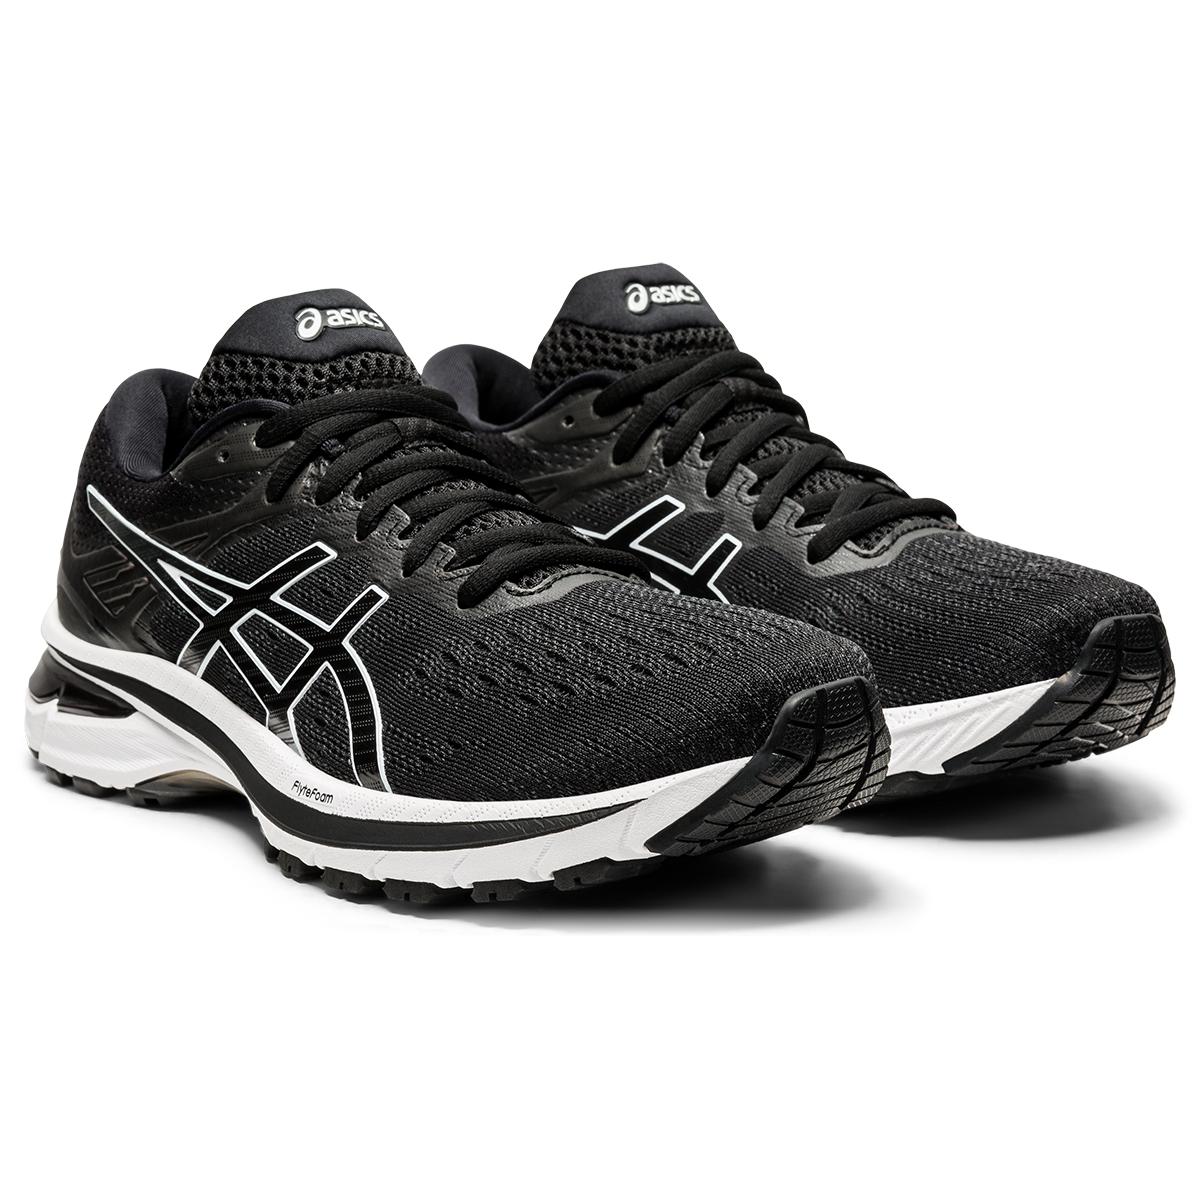 Women's Asics Gt-2000 9 Running Shoe - Color: Black/White - Size: 5 - Width: Regular, Black/White, large, image 3